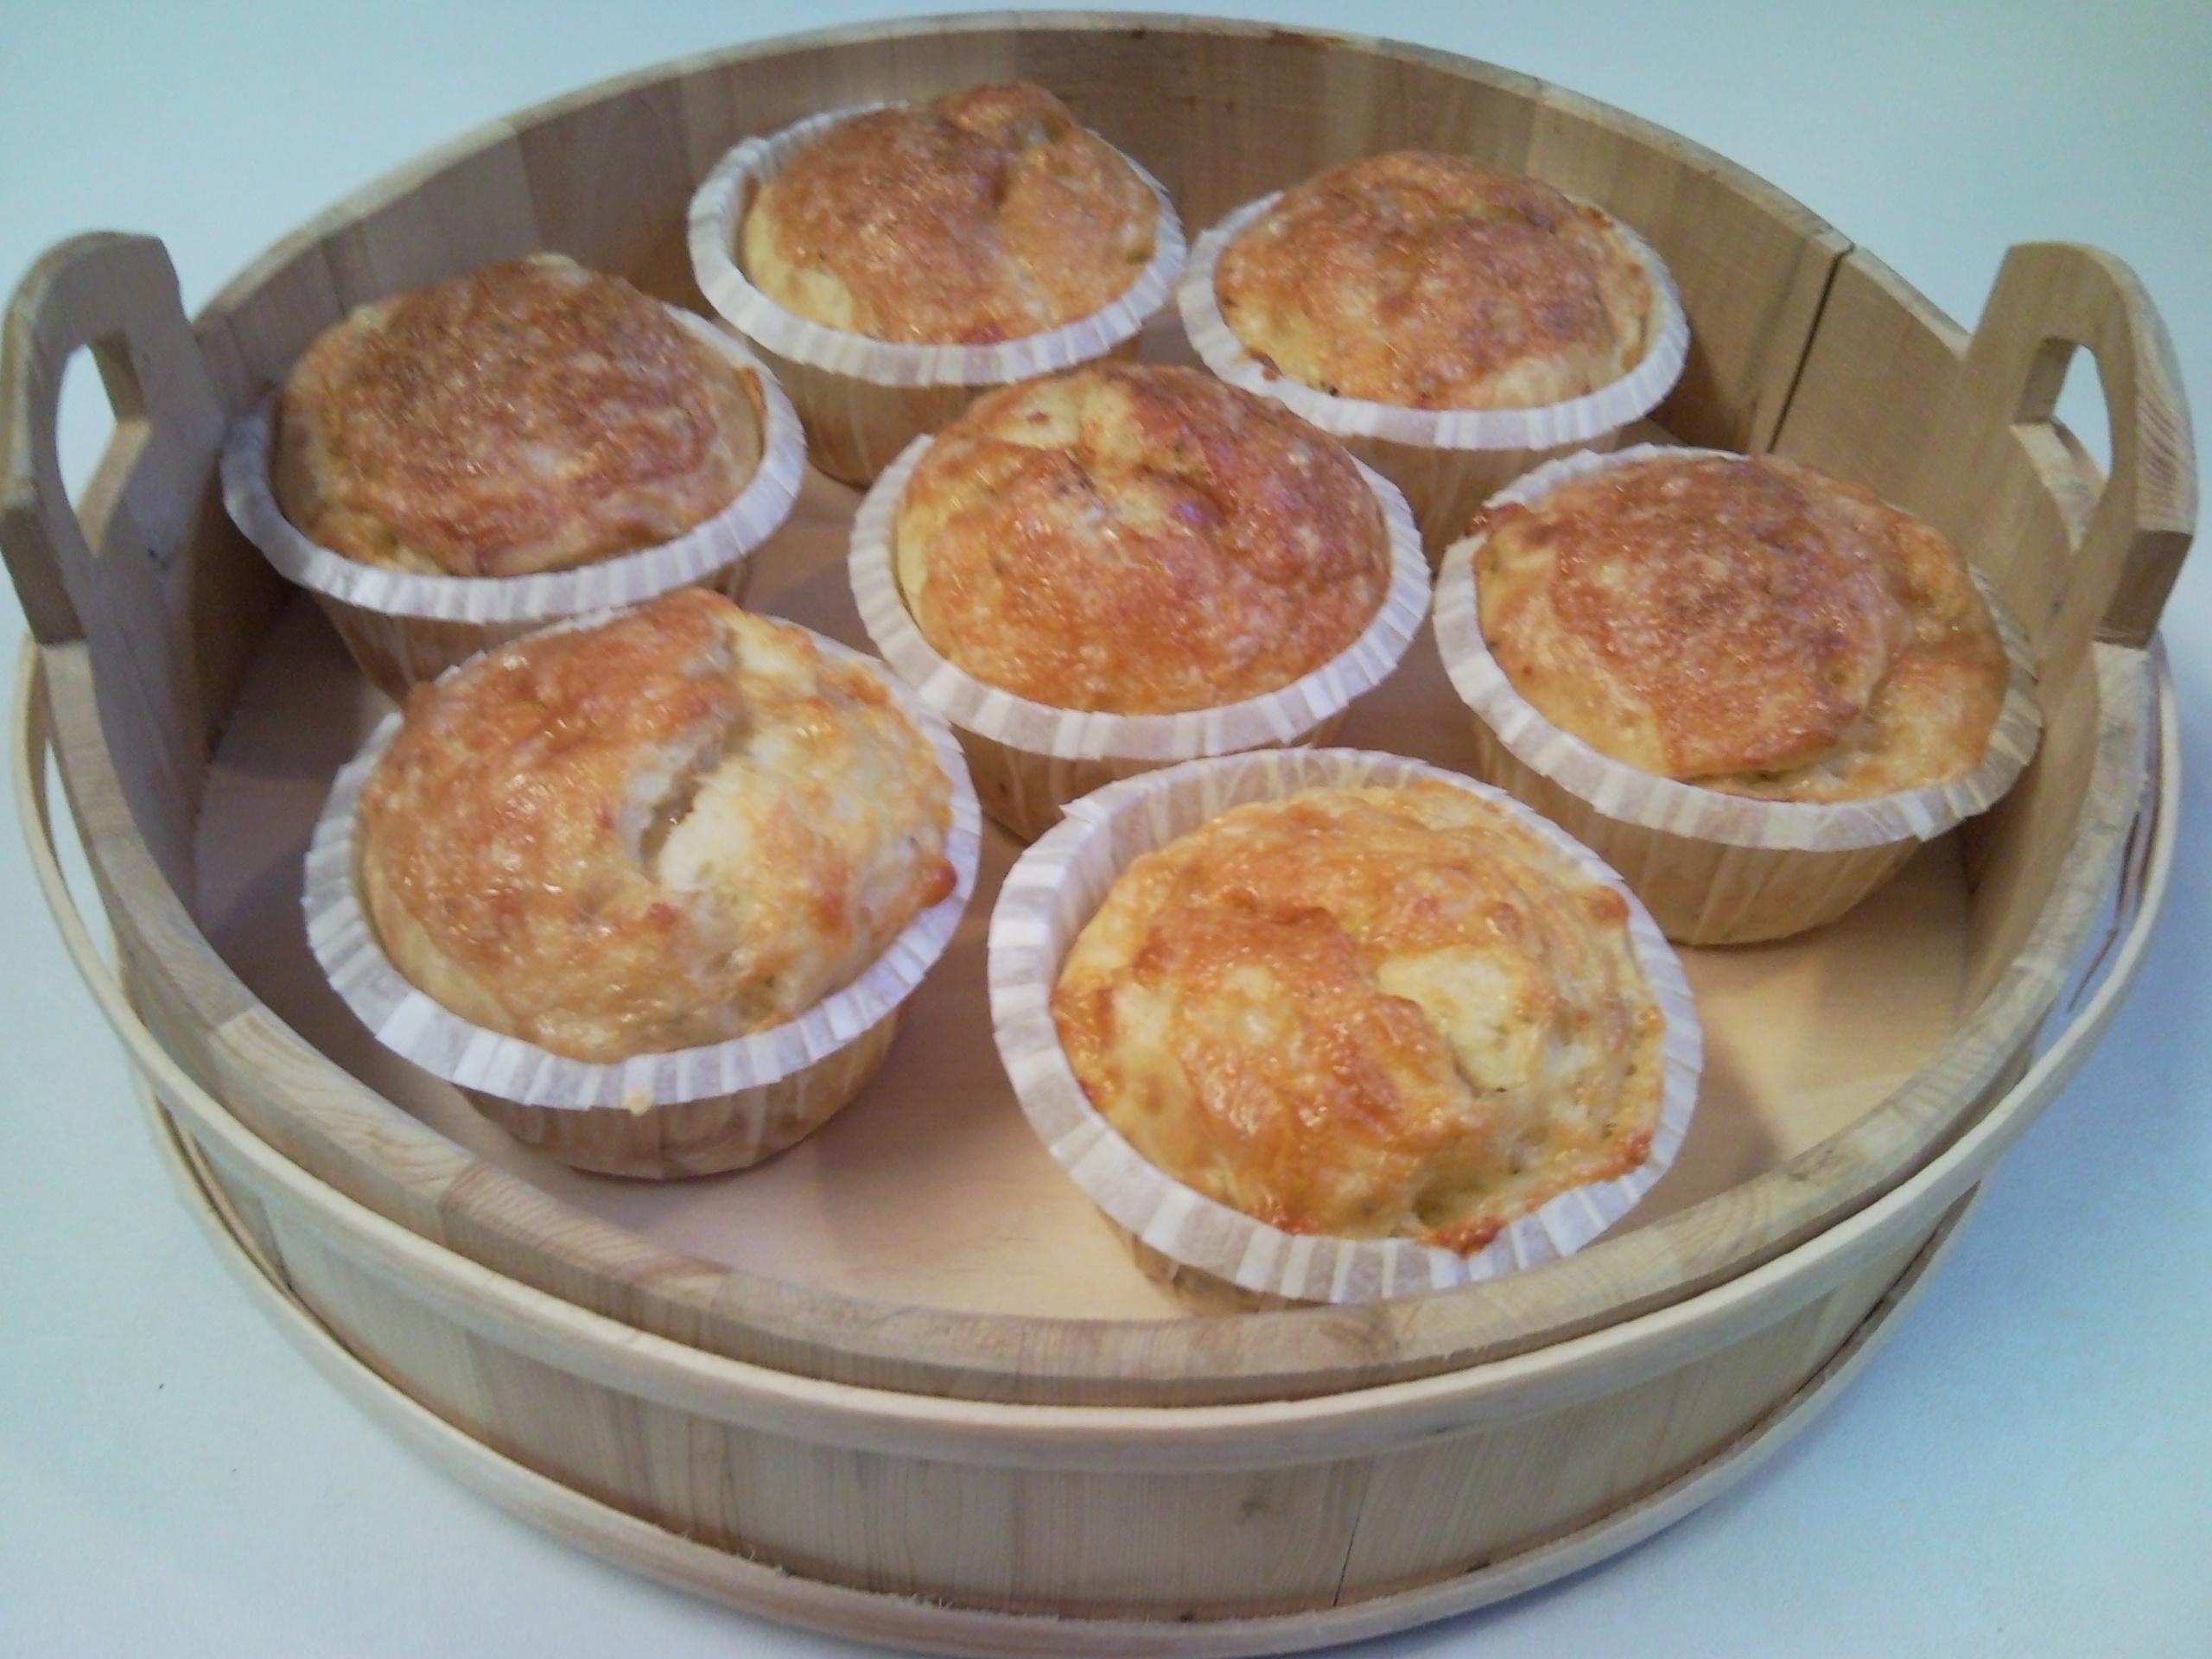 mellanmåls muffins